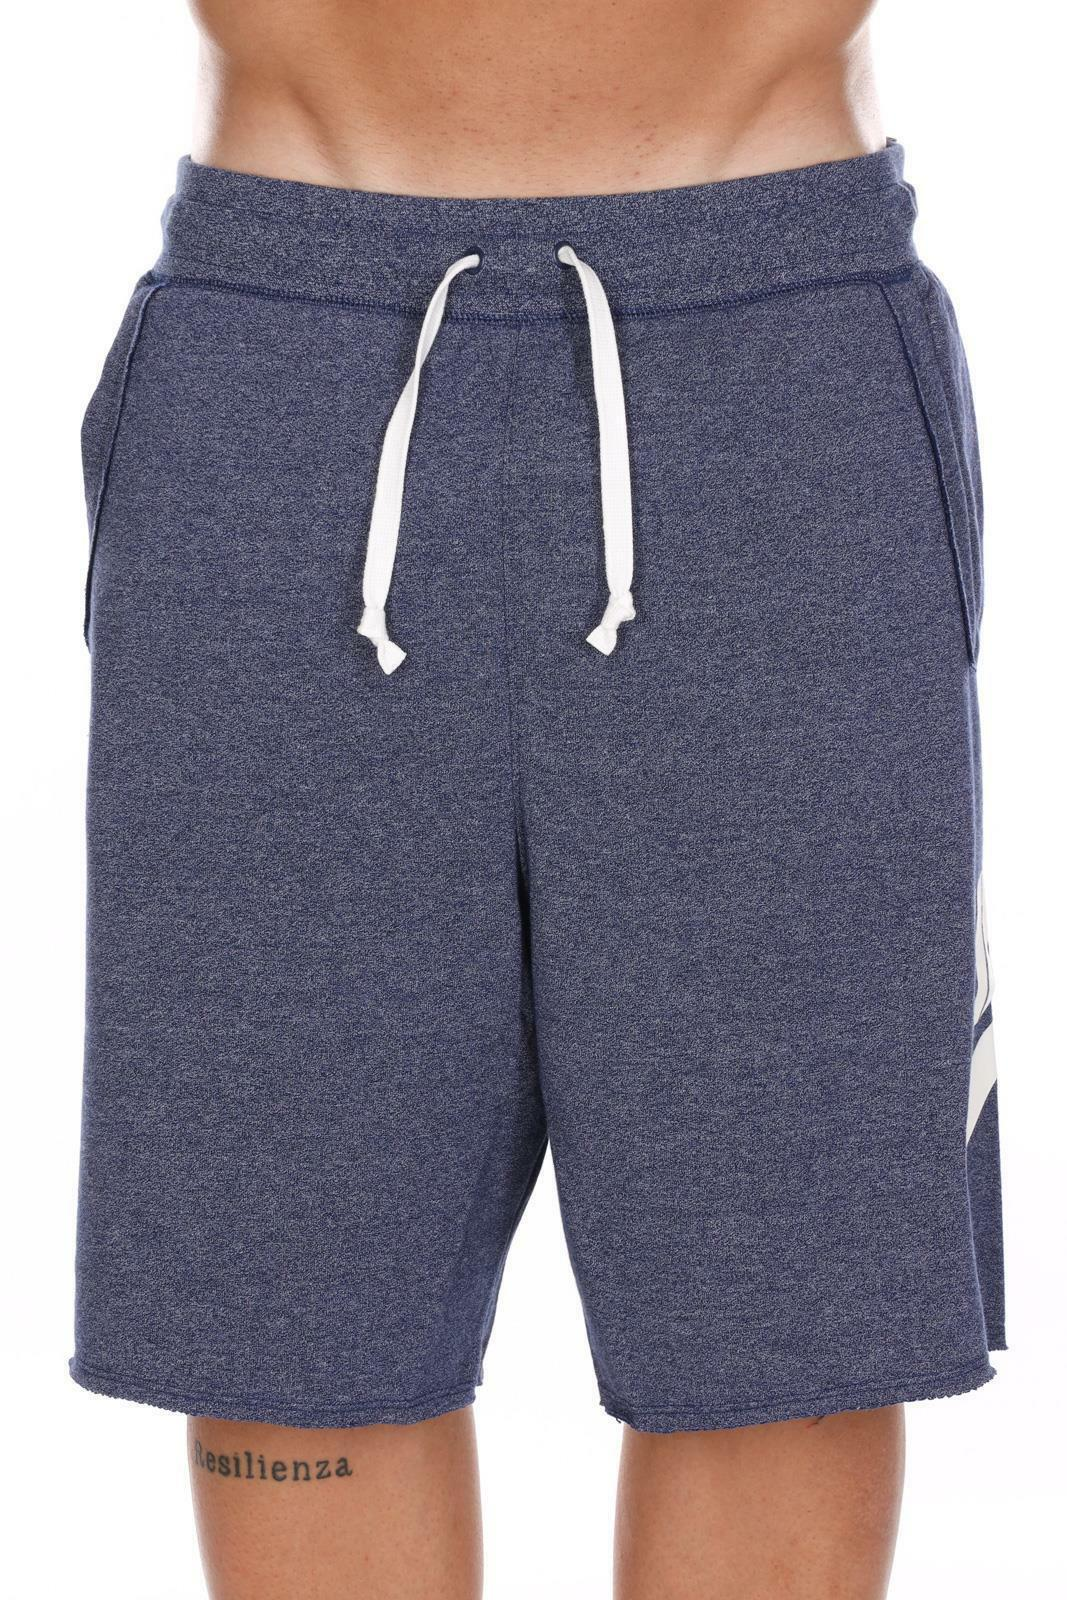 nike nike short ar2375 494 blu pantaloncini uomo